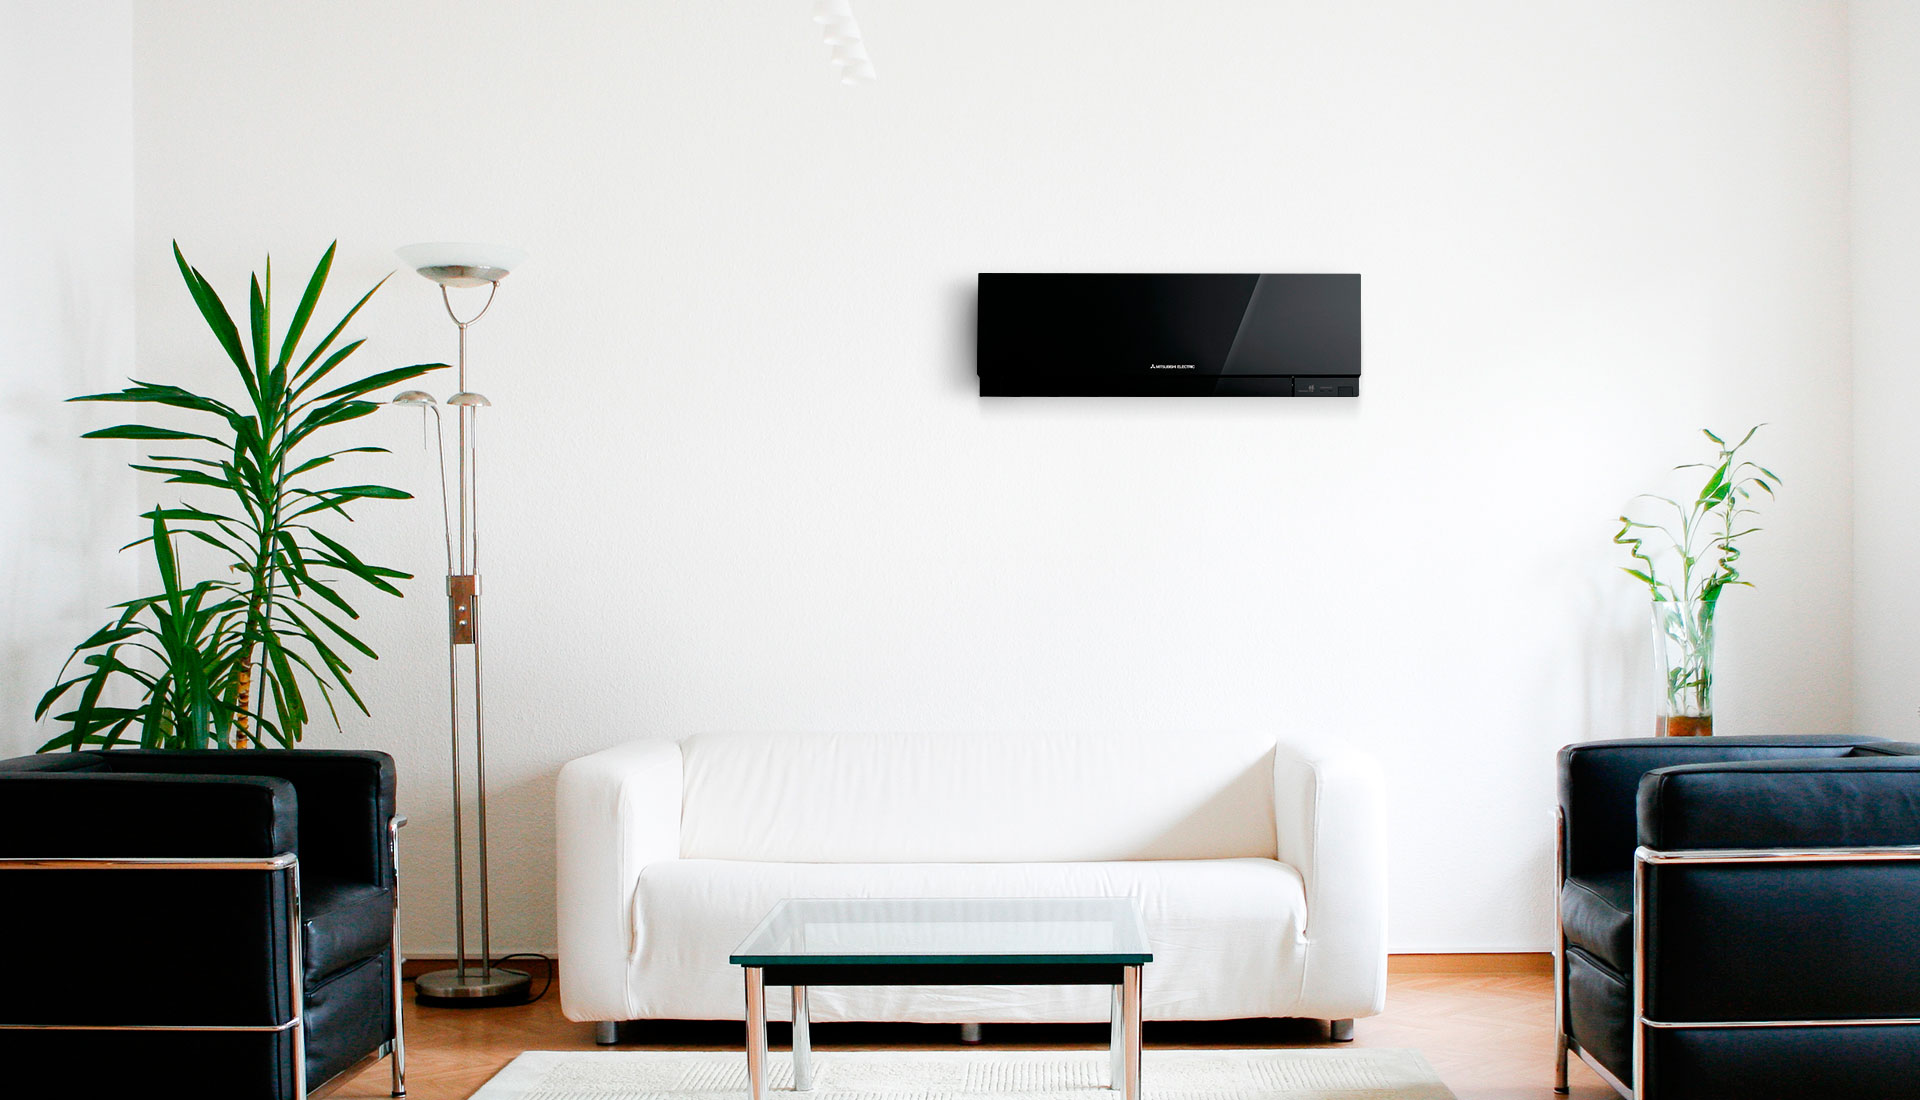 Кондиционеры Mitsubishi Electric Design - интернет-магазин Миллиардум - Краснодар